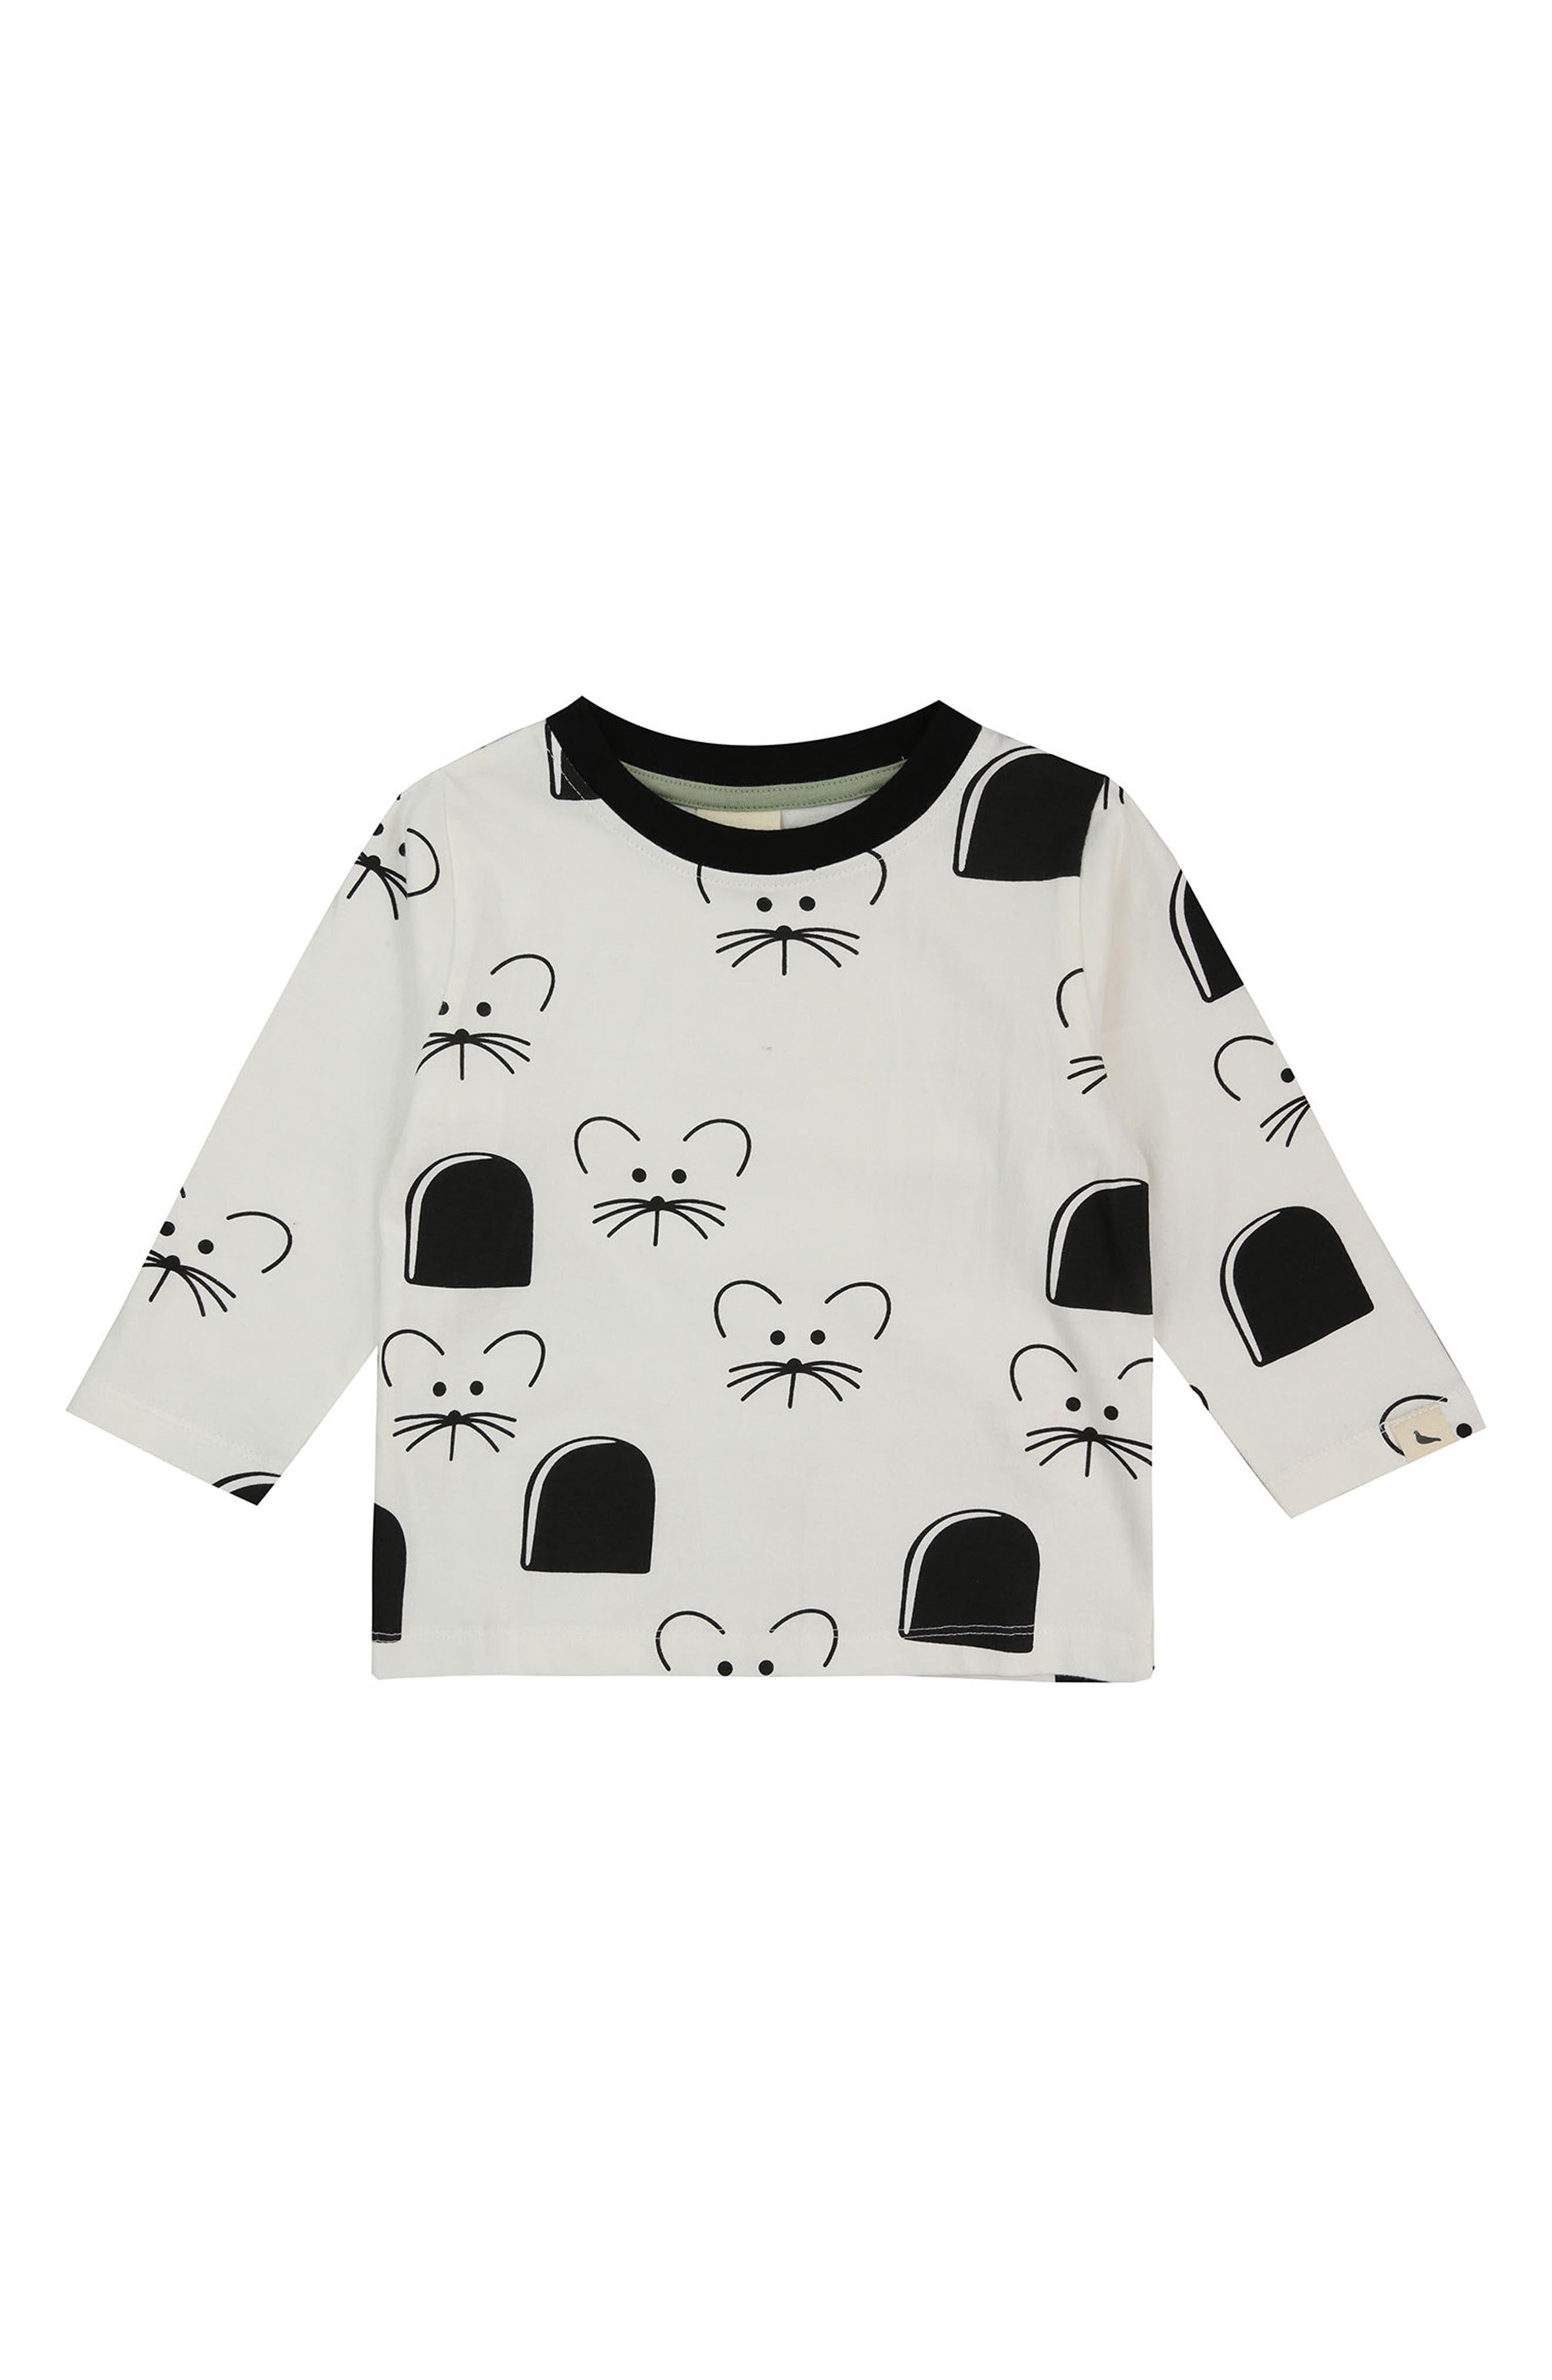 Mouse House Organic Cotton Shirt,                         Main,                         color, 100